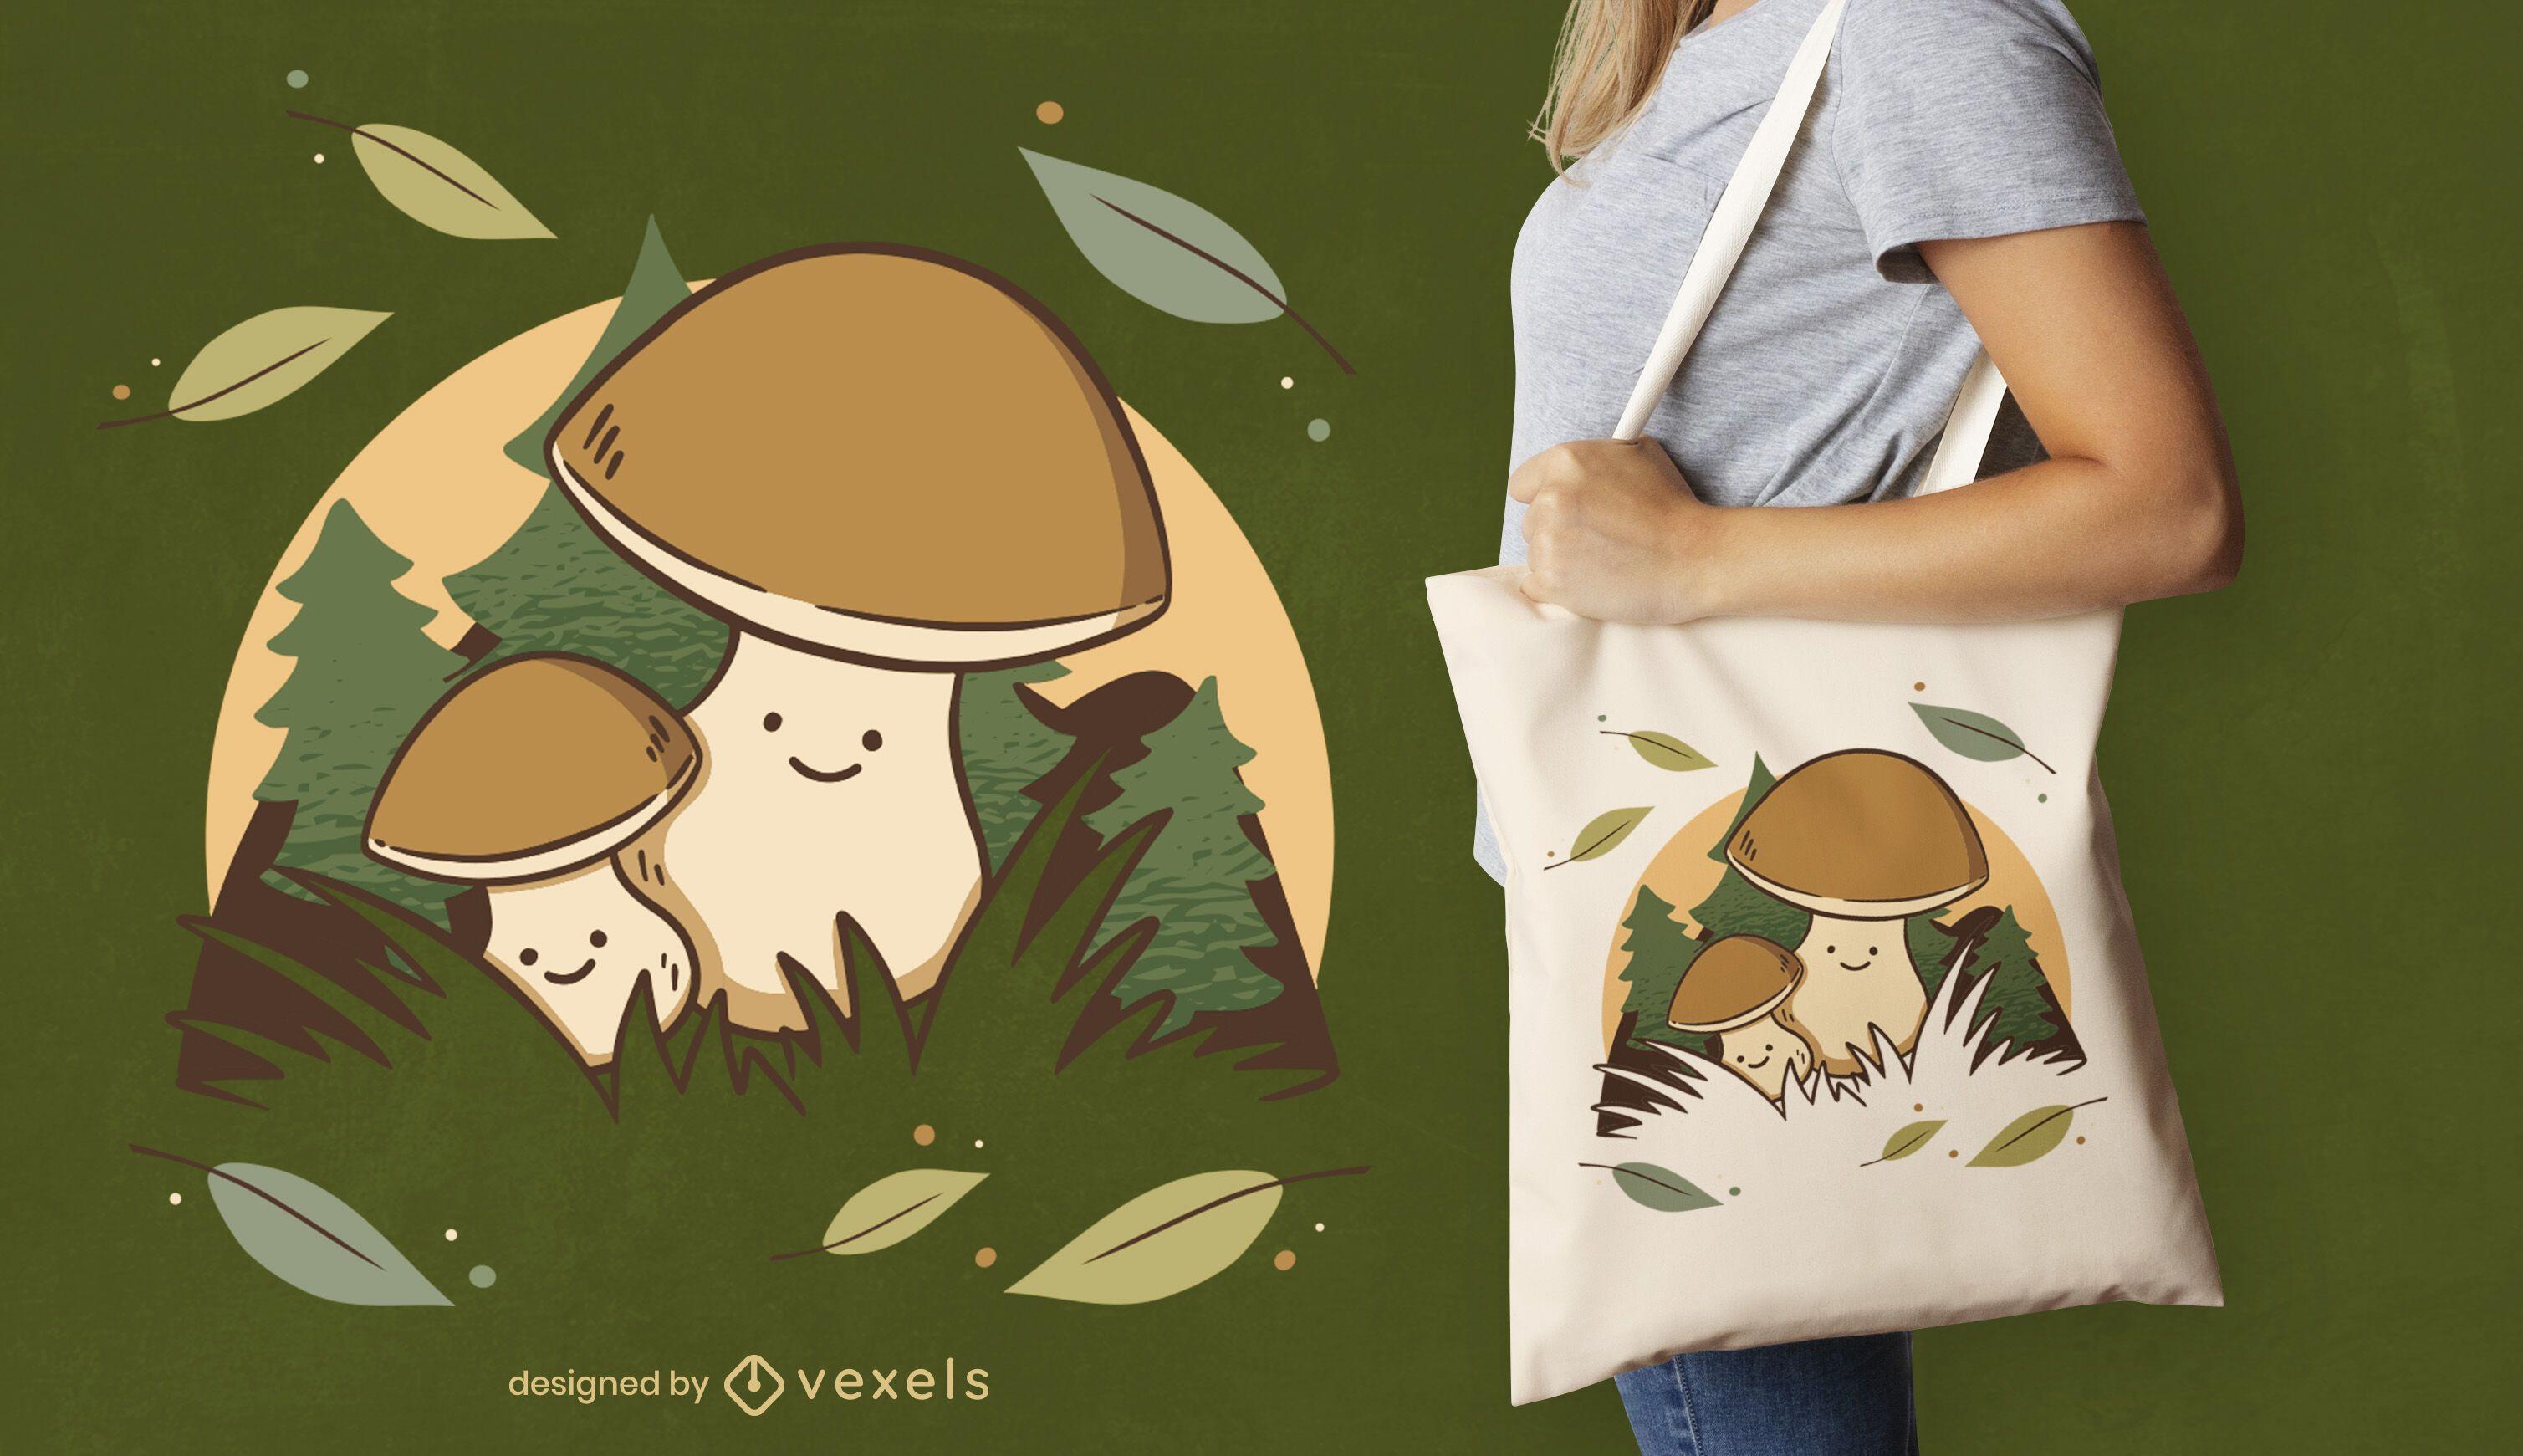 Cute mushroom characters tote bag